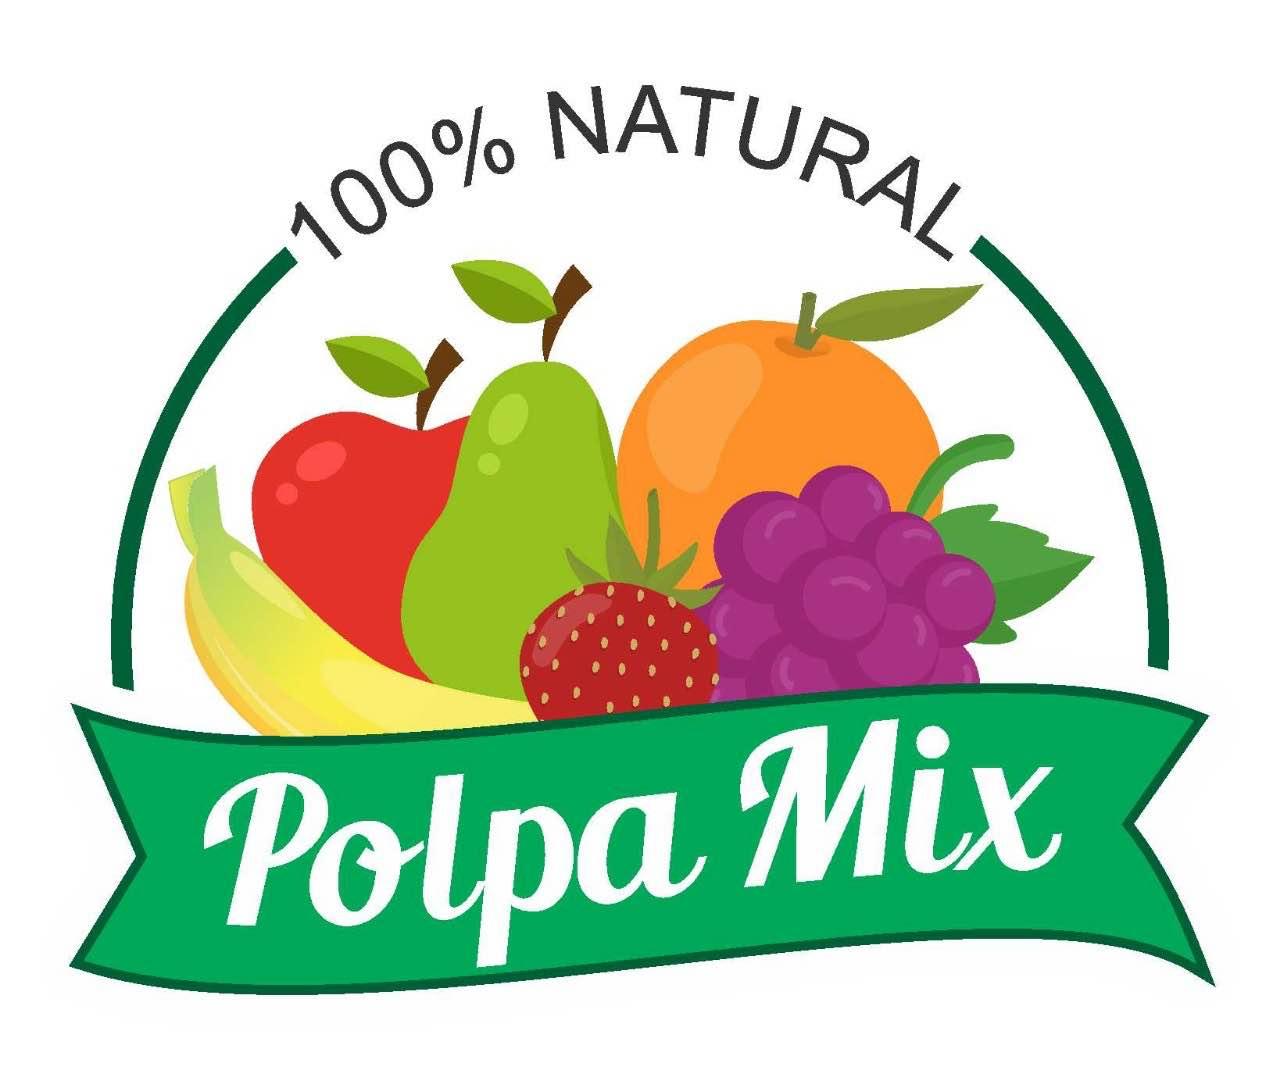 Polpa Mix